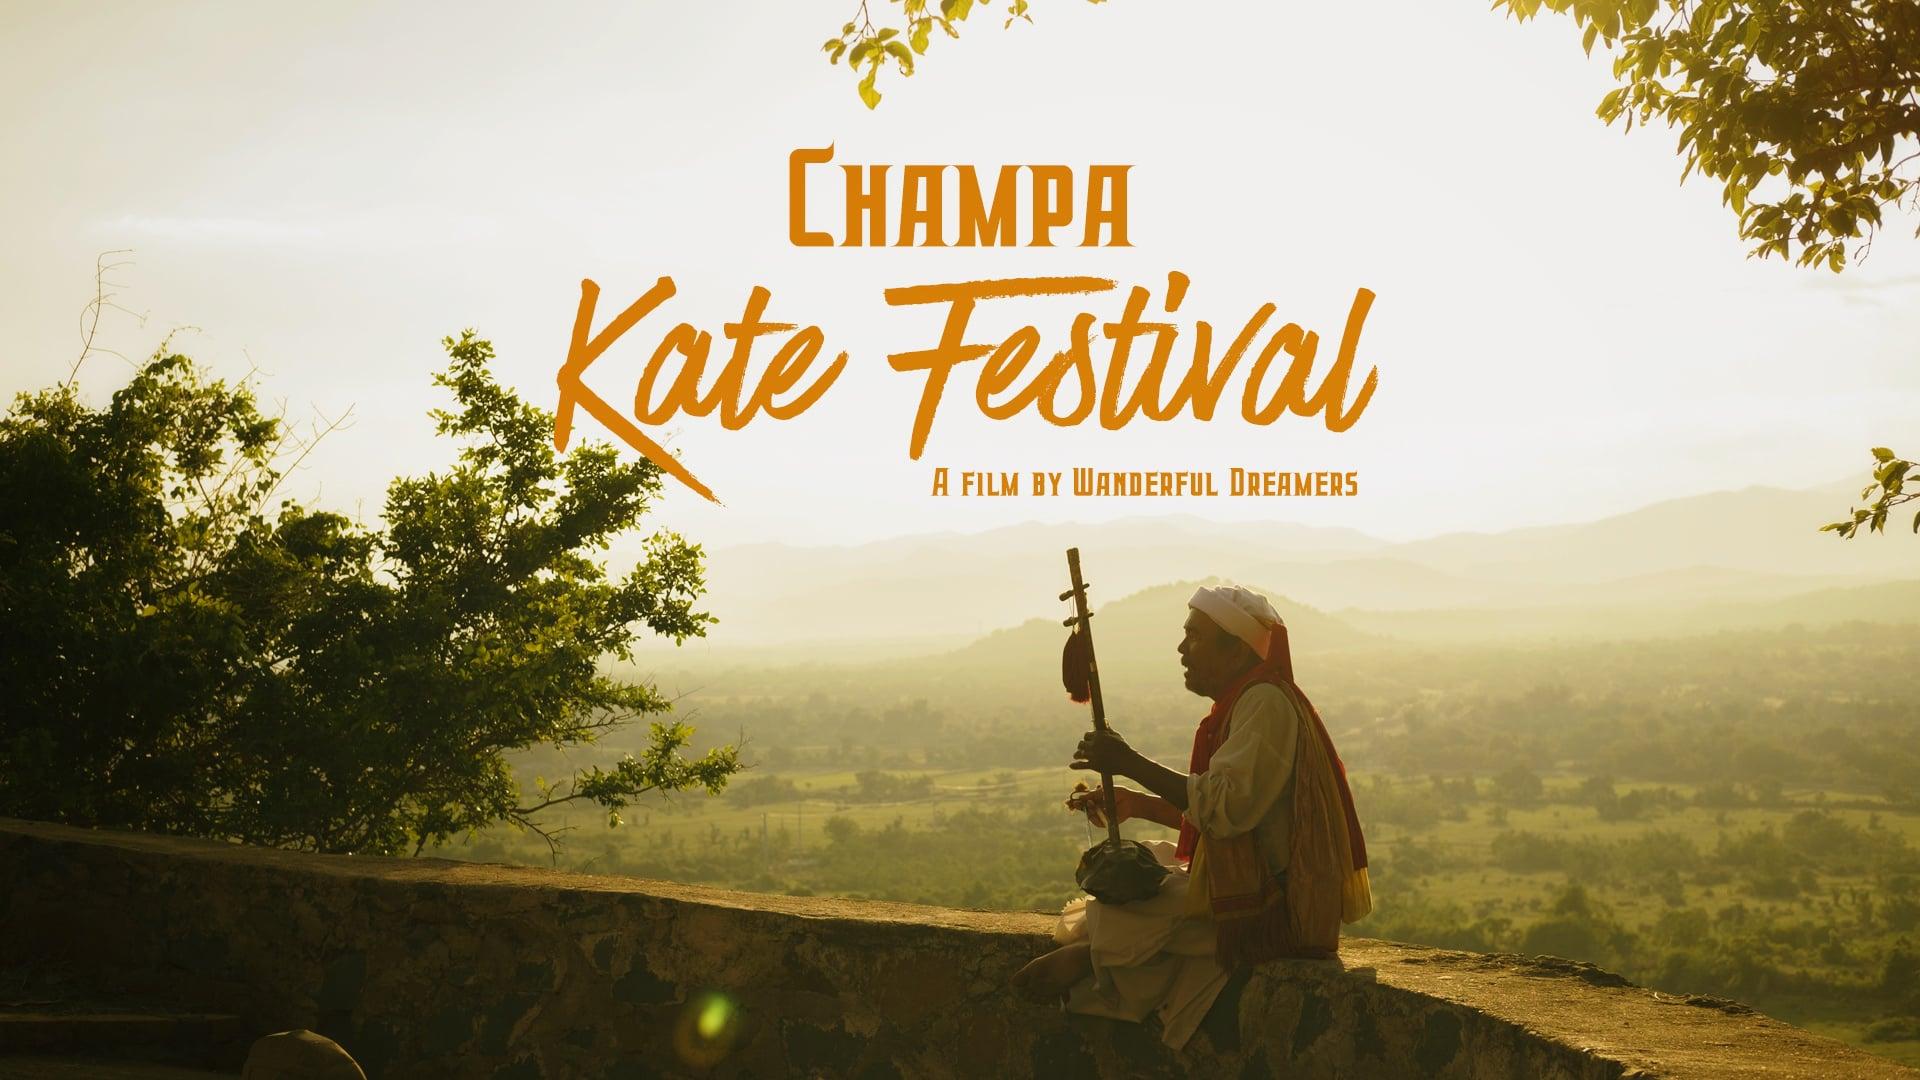 Champa Kate Festival (Ninh Thuan, Vietnam)